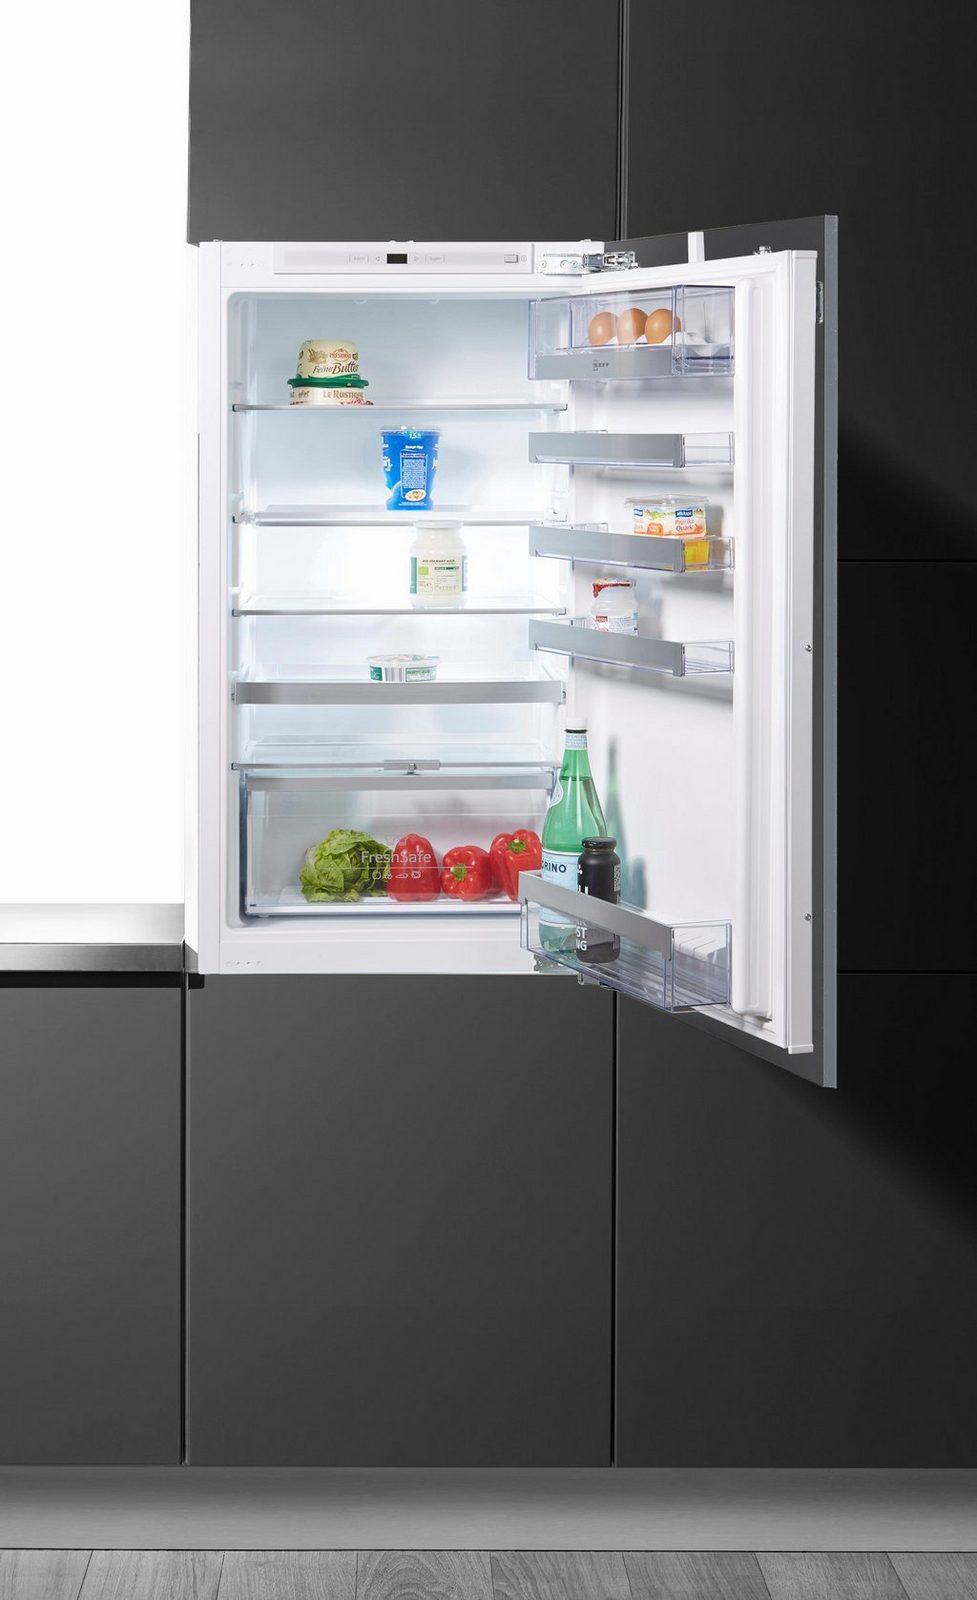 Neff Integrierbarer Einbaukühlschrank K335A2 / KI1313F30 - broschei